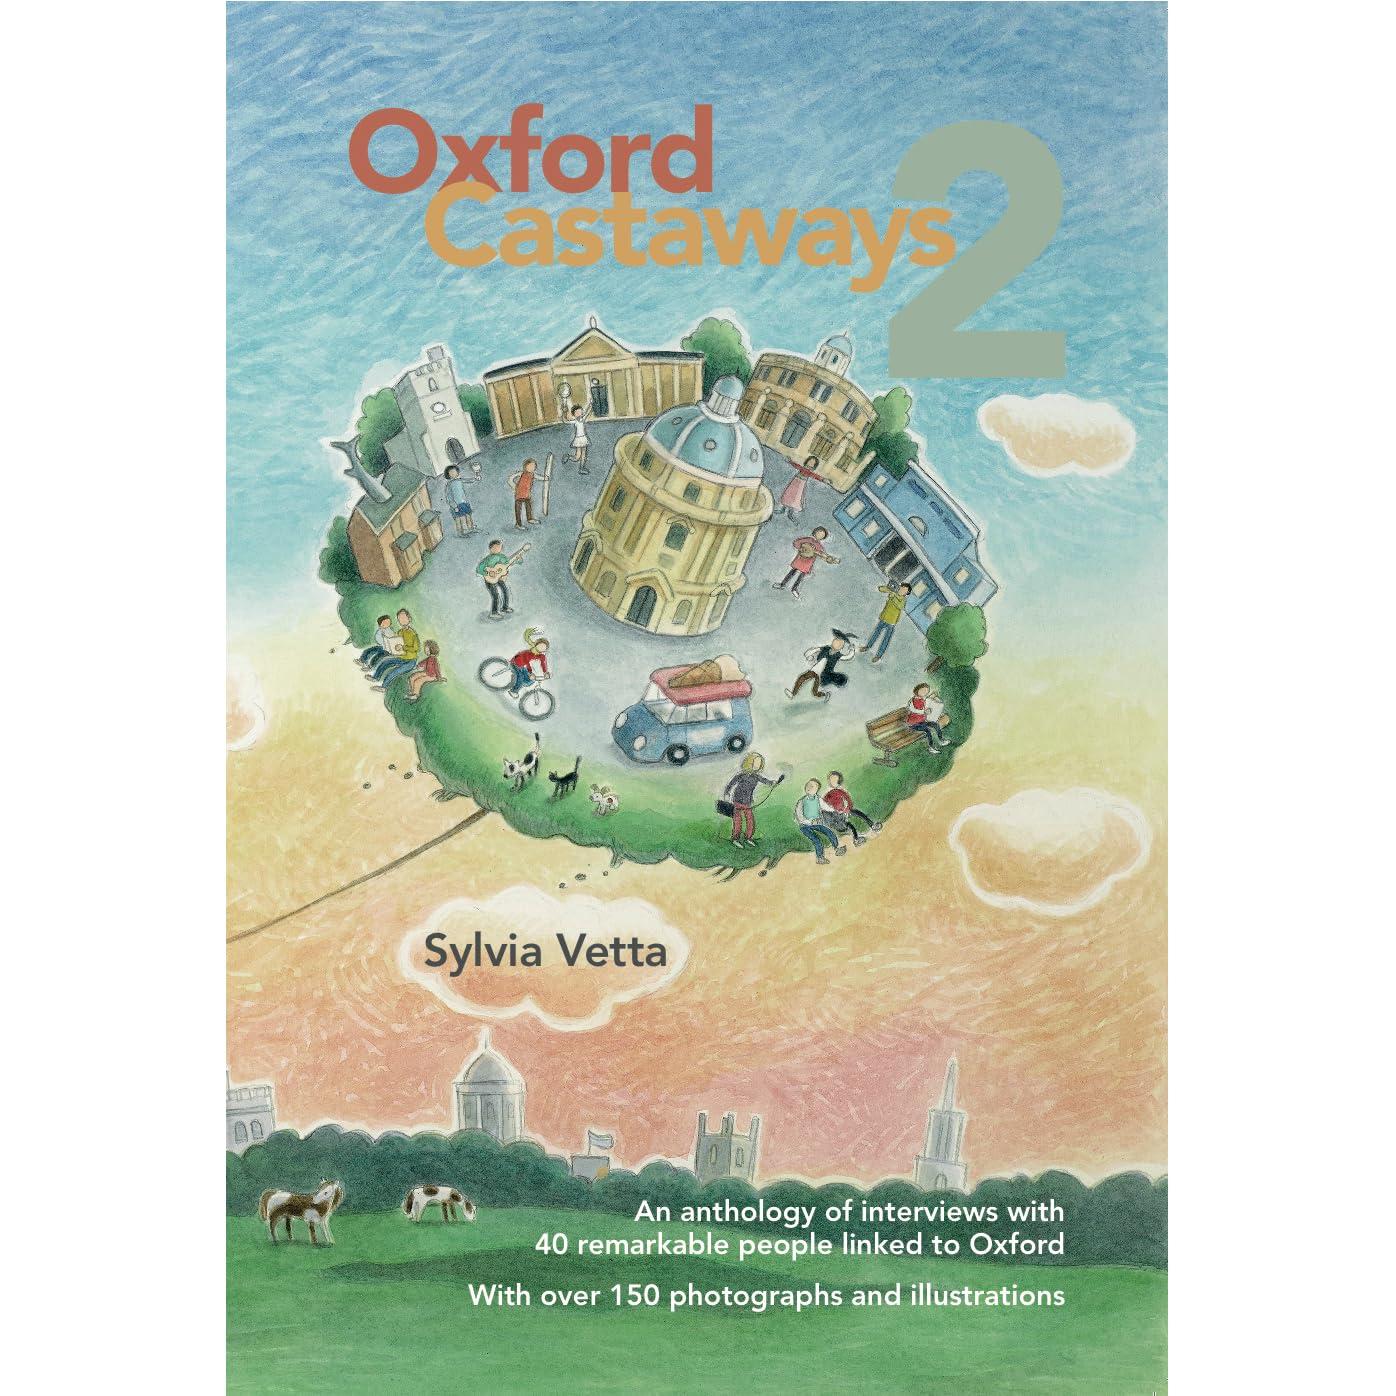 Oxford Castaways 2 By Sylvia Vetta